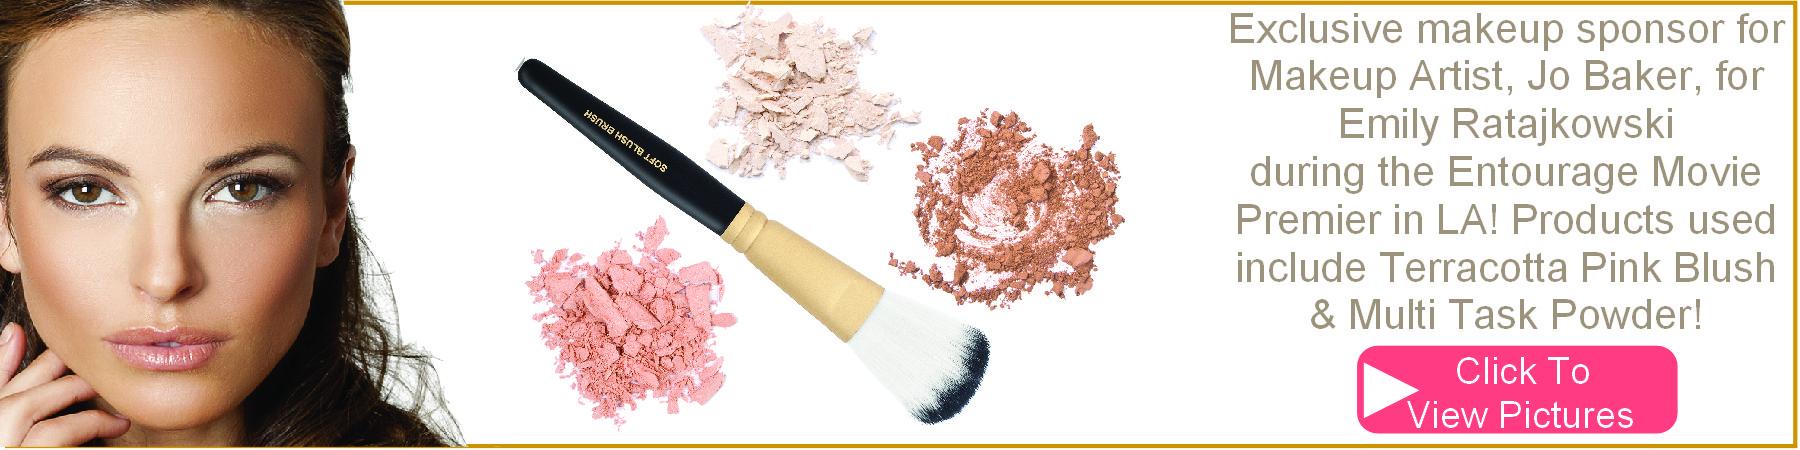 Rejuva Minerals, Inc. Mica Free, Titanium Dioxide Free Mineral Makeup